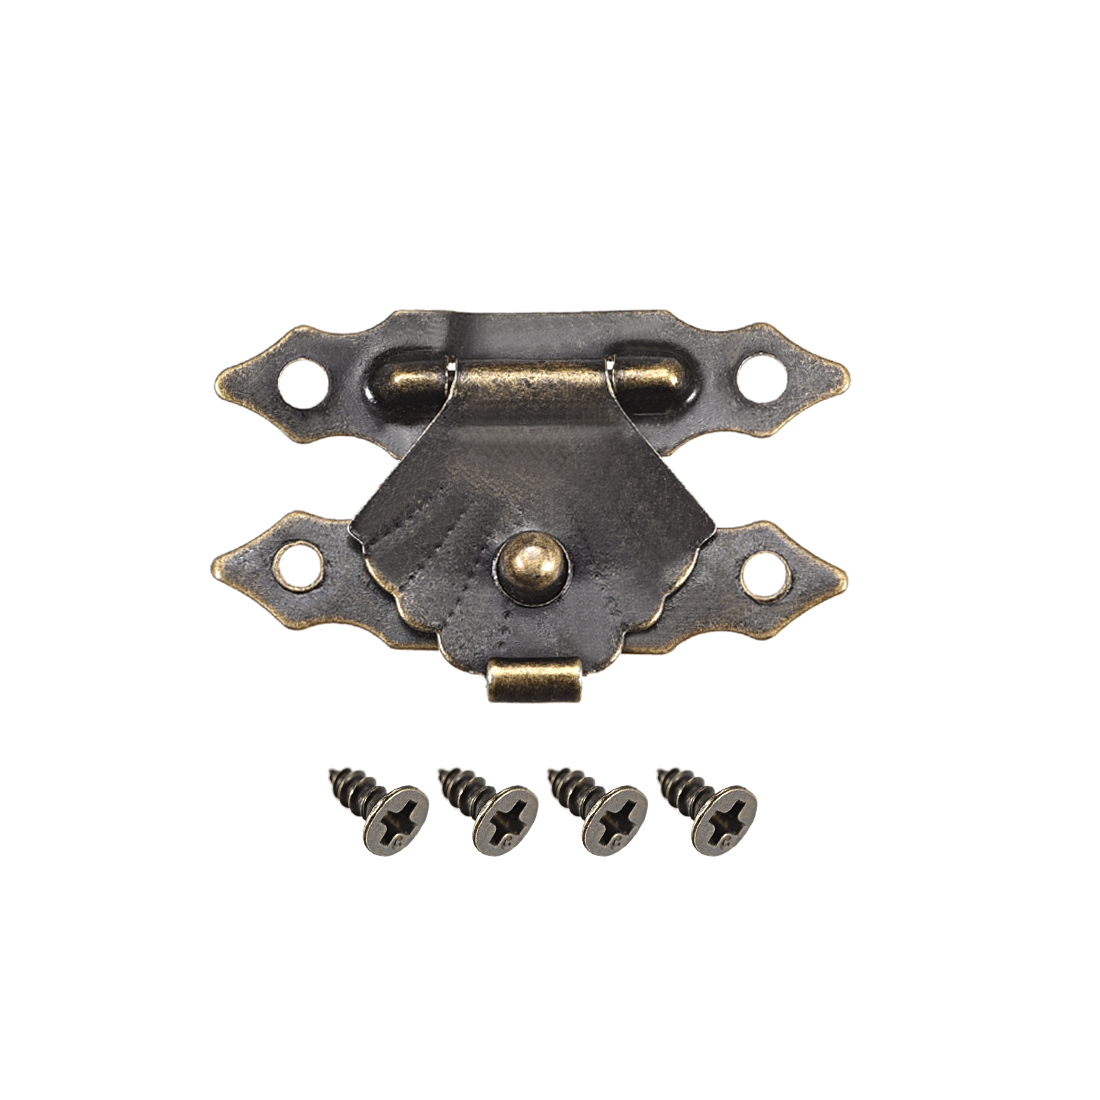 Wood Case Box Hasp 29x19mm Antique Latches Hook Bronze Tone, 20 Pcs